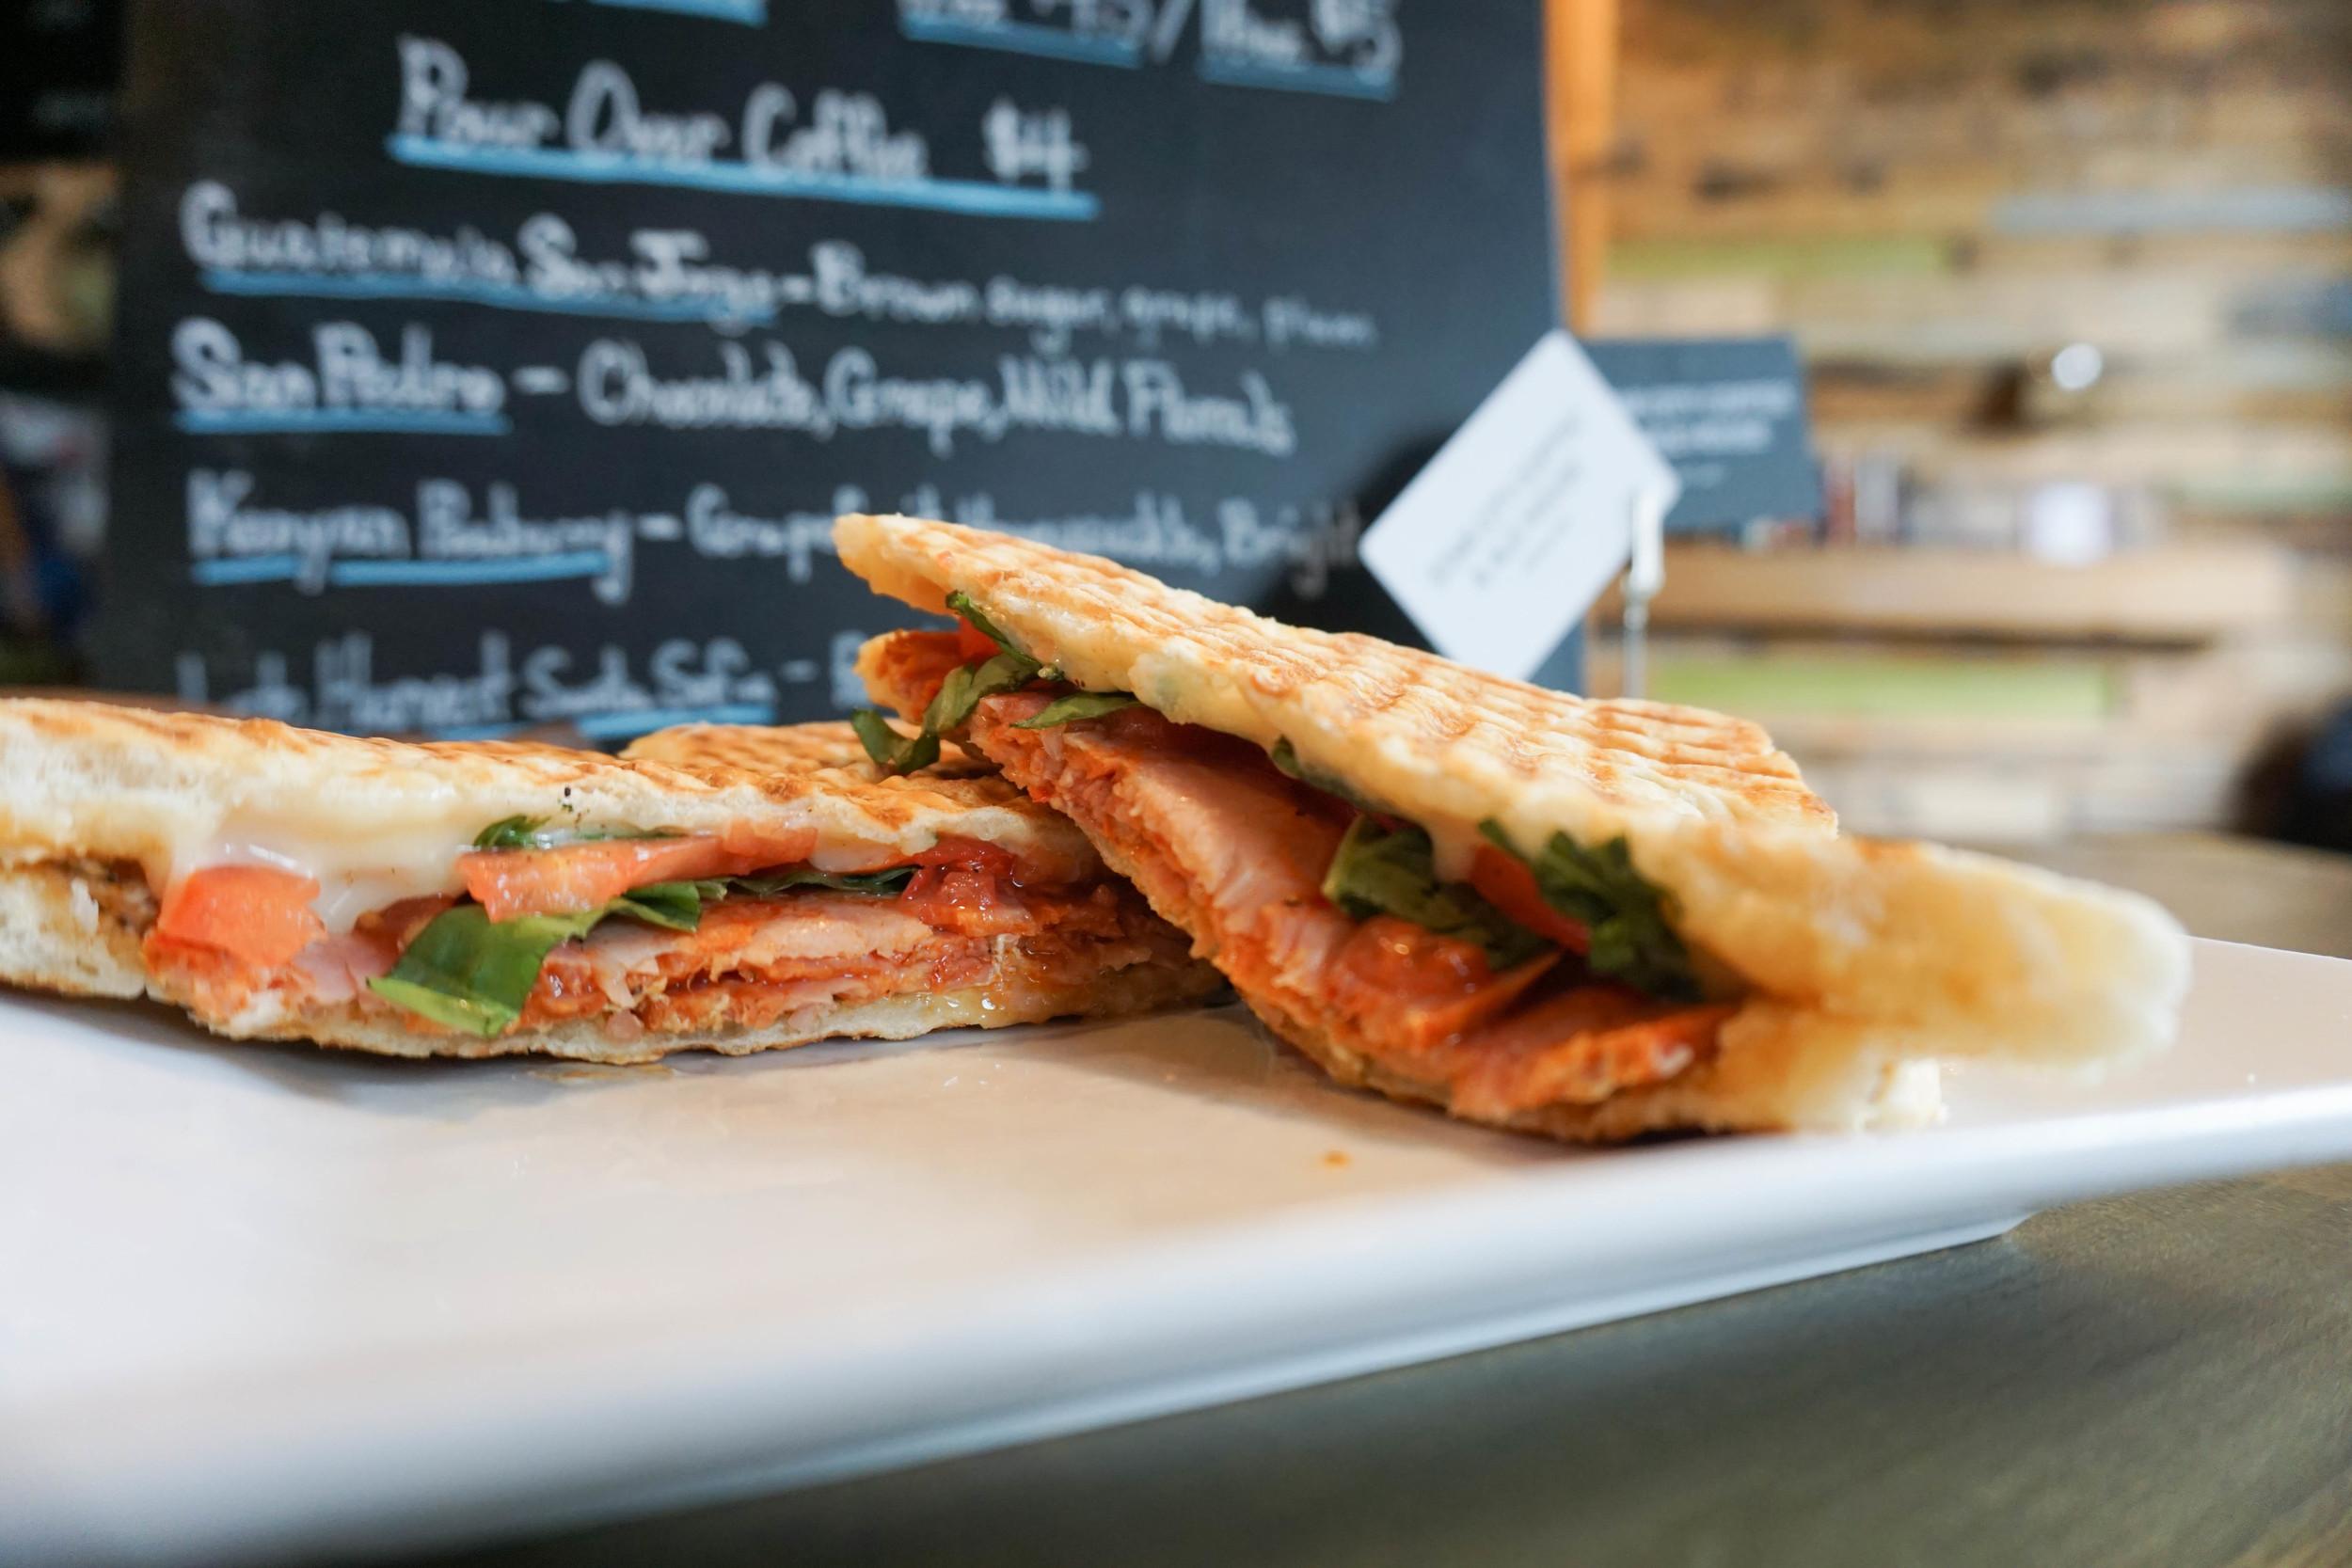 "<alt =""Lafayette panini press sandwich"">"